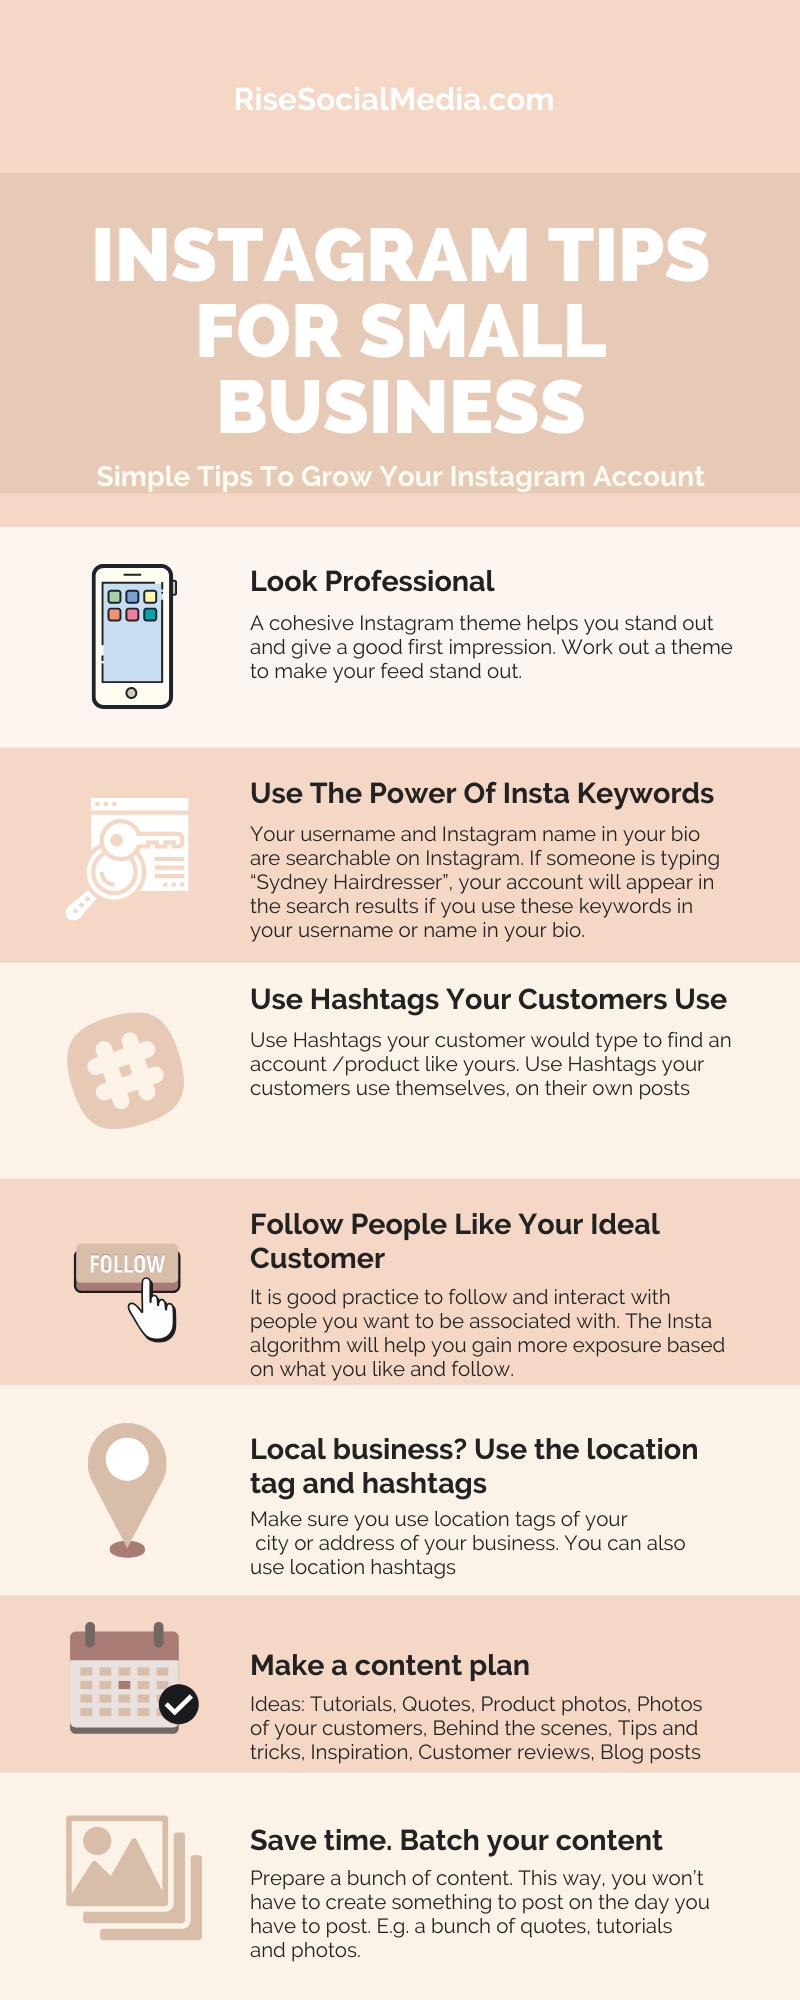 7 Instagram Tips For Small Business In 2020 Instagram Algorithm Instagram Marketing Tips Instagram Tips